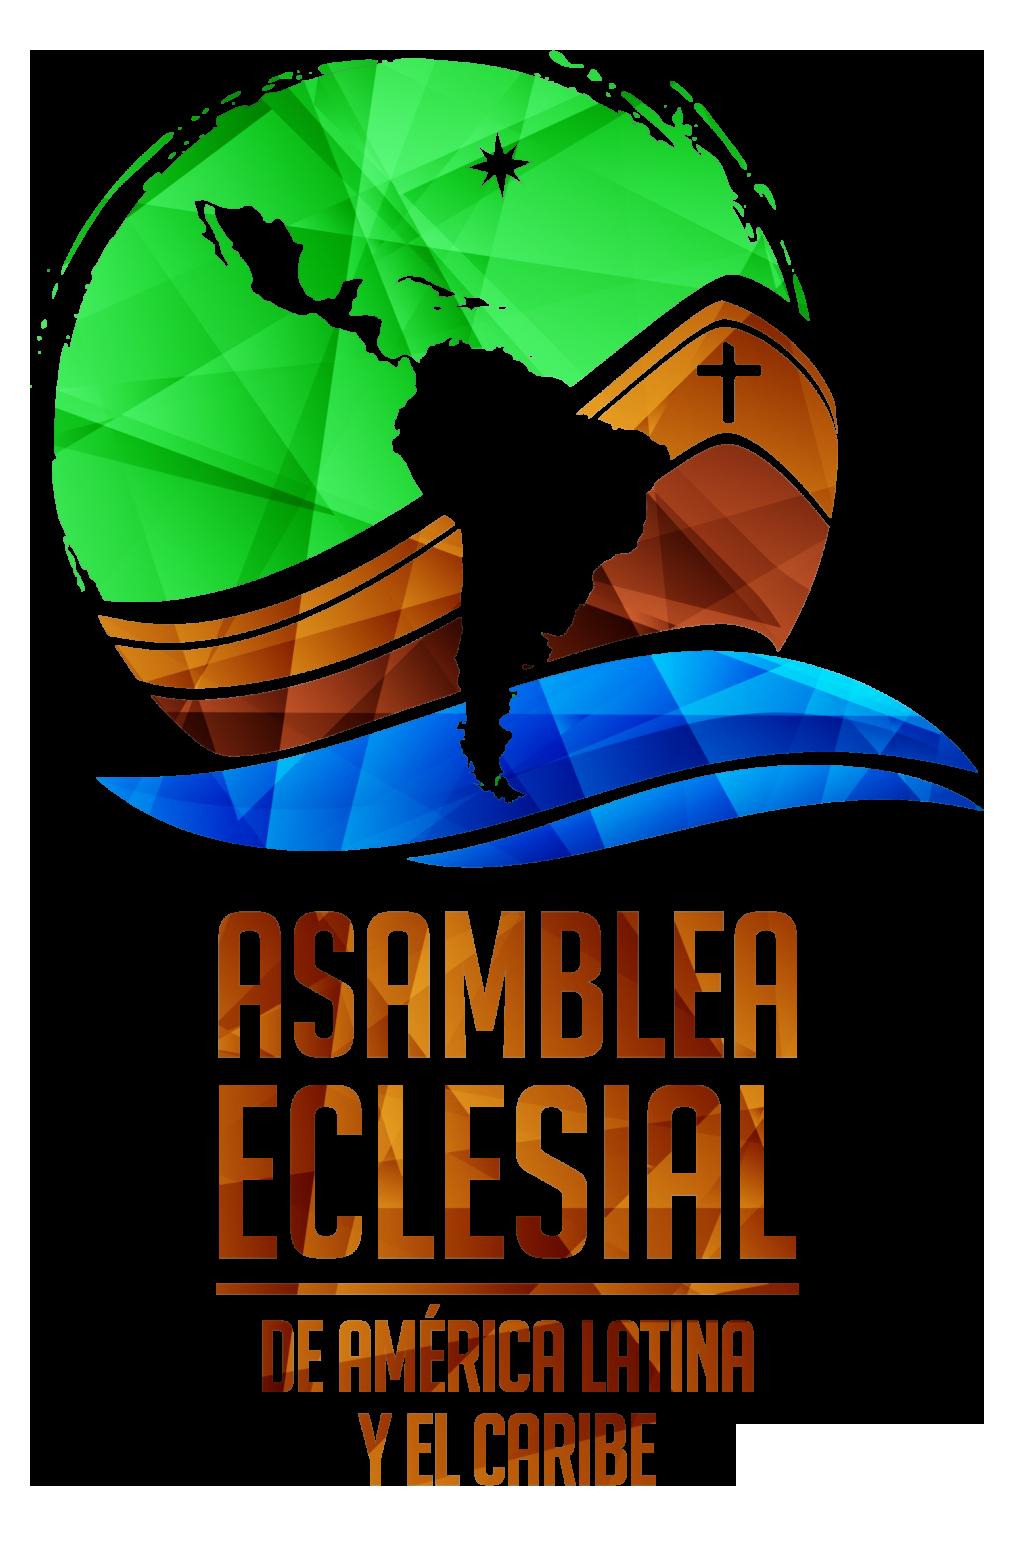 http://arquimercedes-lujan.com.ar/wp-content/uploads/2021/06/logo-asamblea-eclesial-vertical-1345x2048-1.png